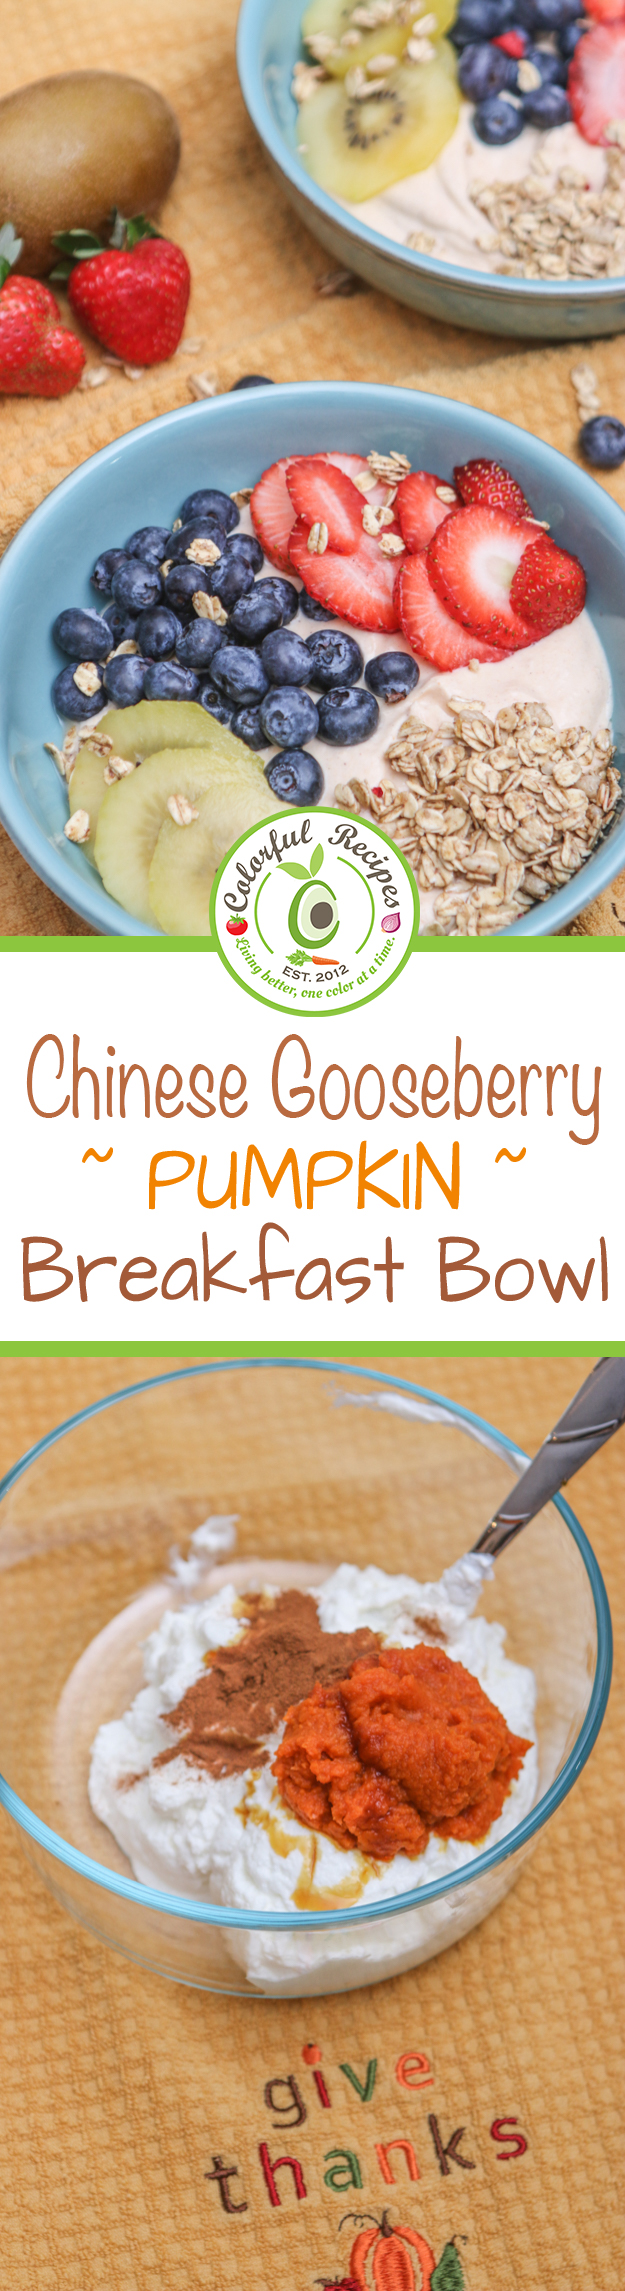 Chinese Gooseberry Pumpkin Breakfast Bowl